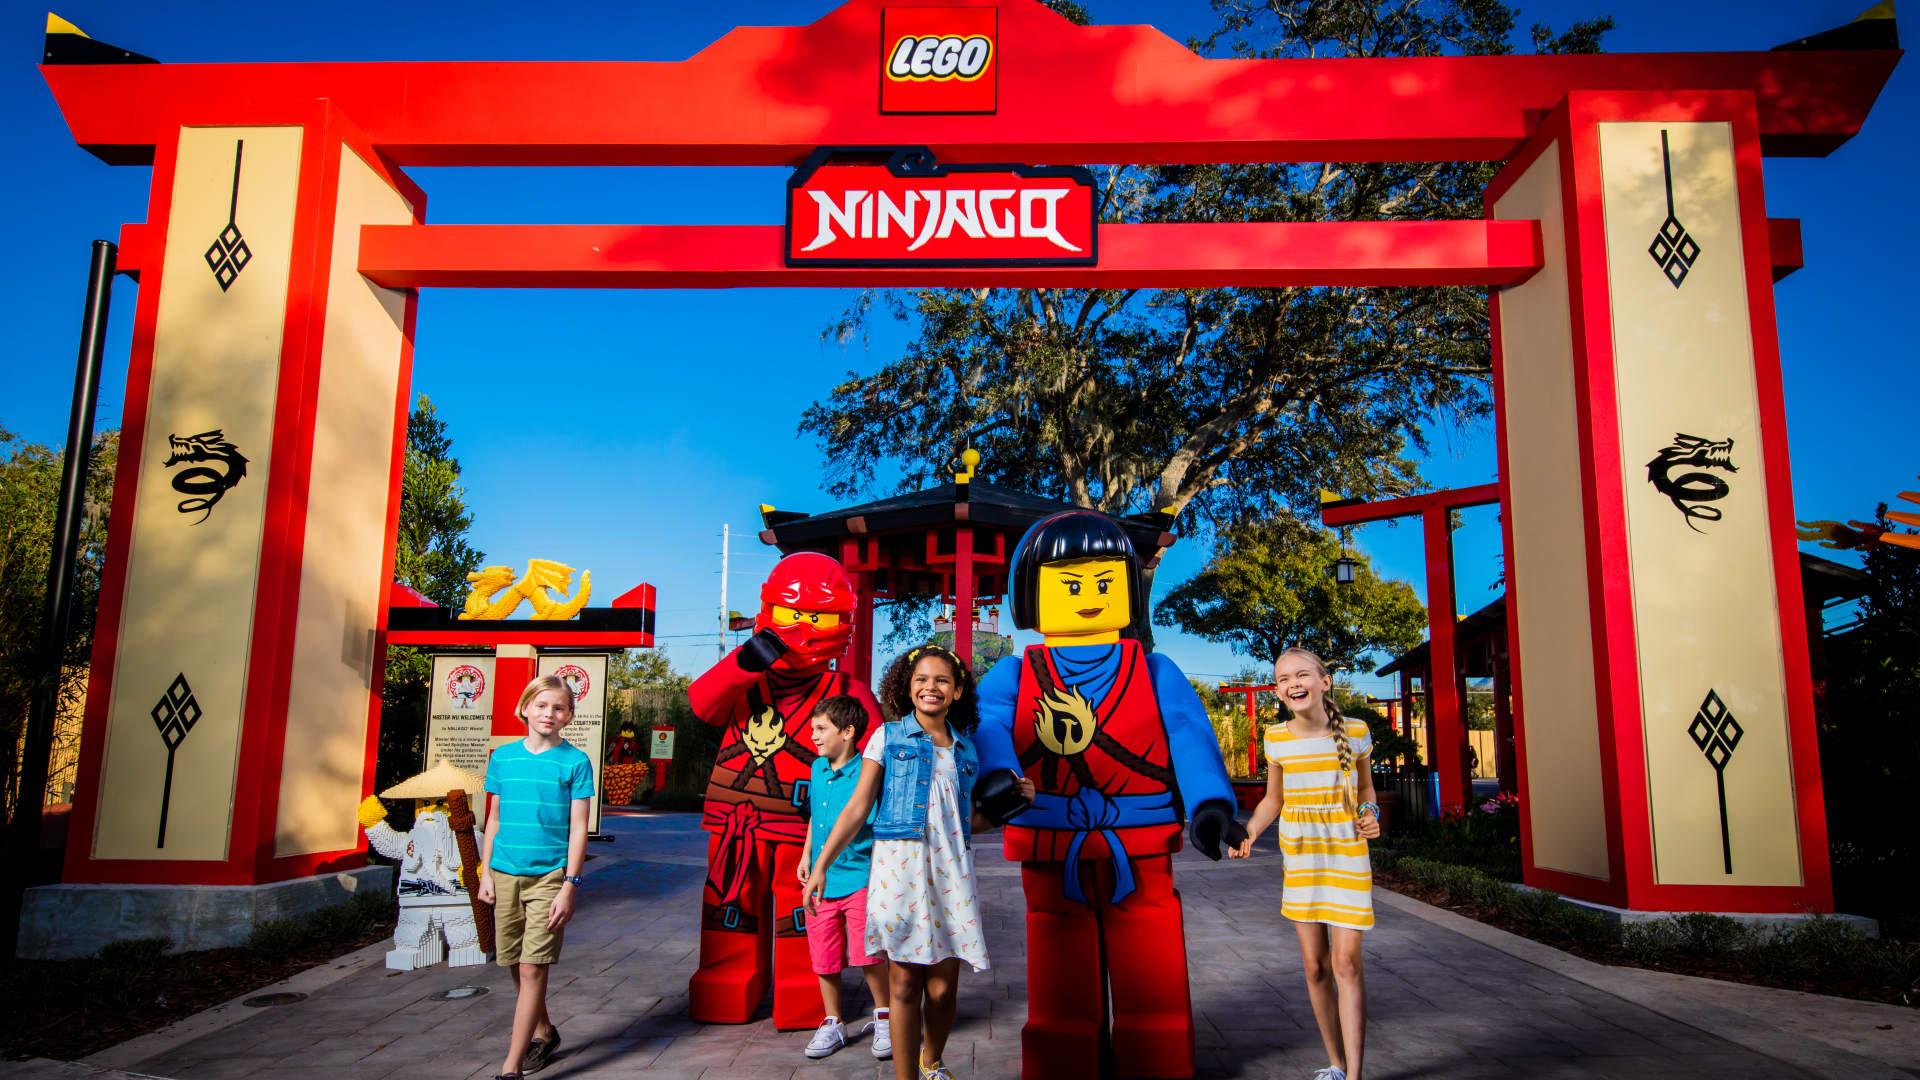 The LEGO NINJAGO World section of LEGOLAND Florida Resort in Winter Haven, Florida.